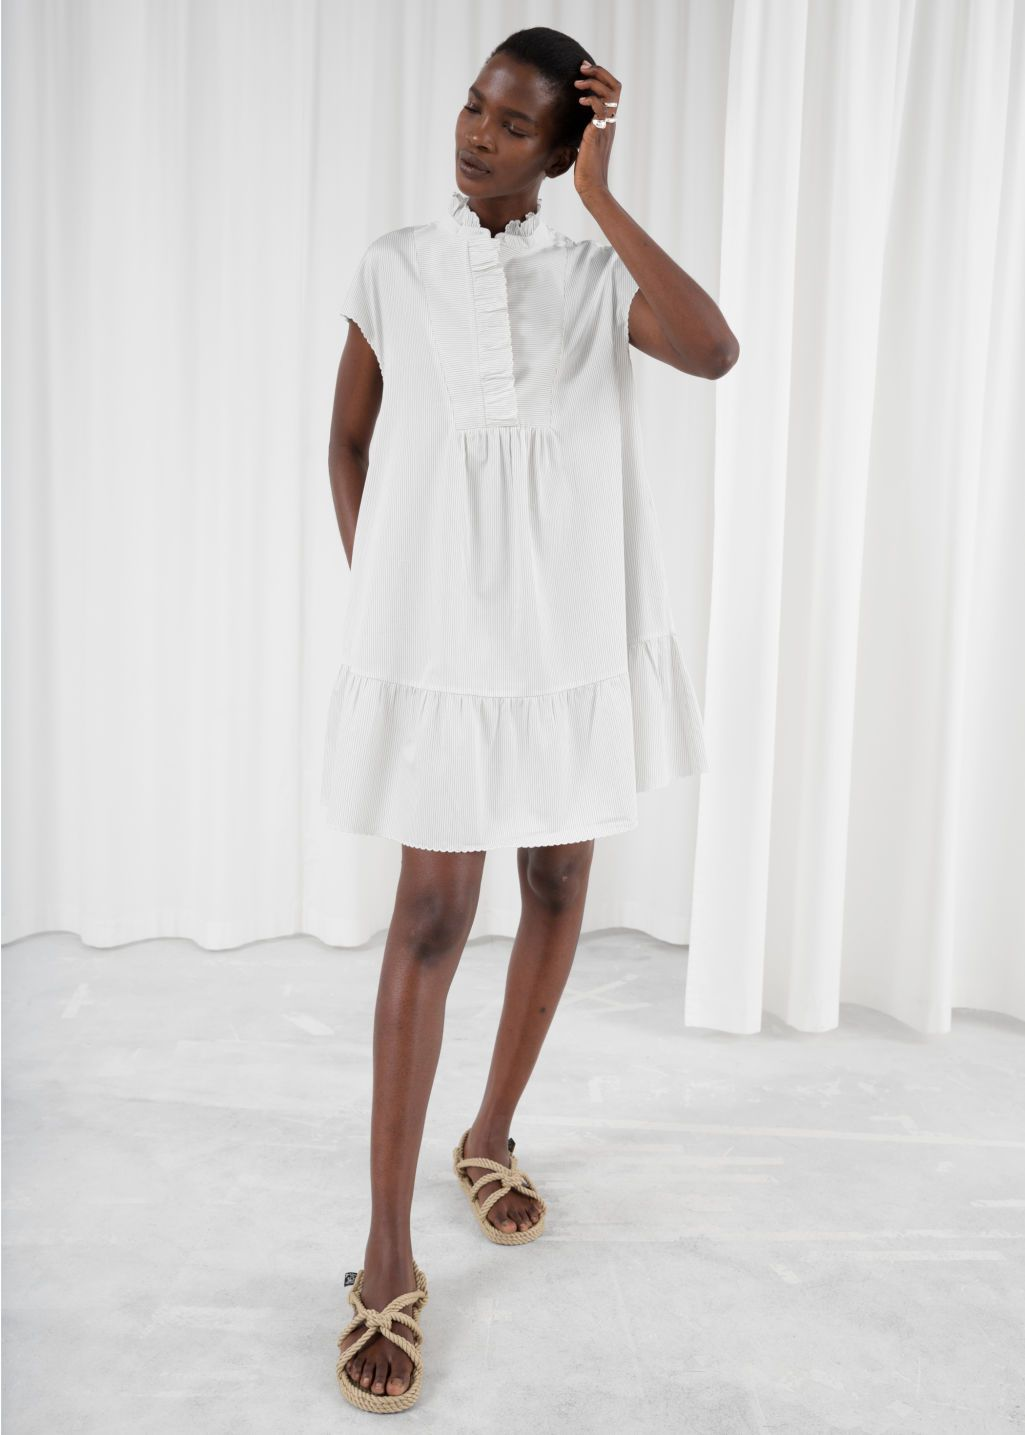 1315db2414e5b Ruffle Bib Shirt Dress | Sewing in 2019 | Dresses, Dress outfits ...